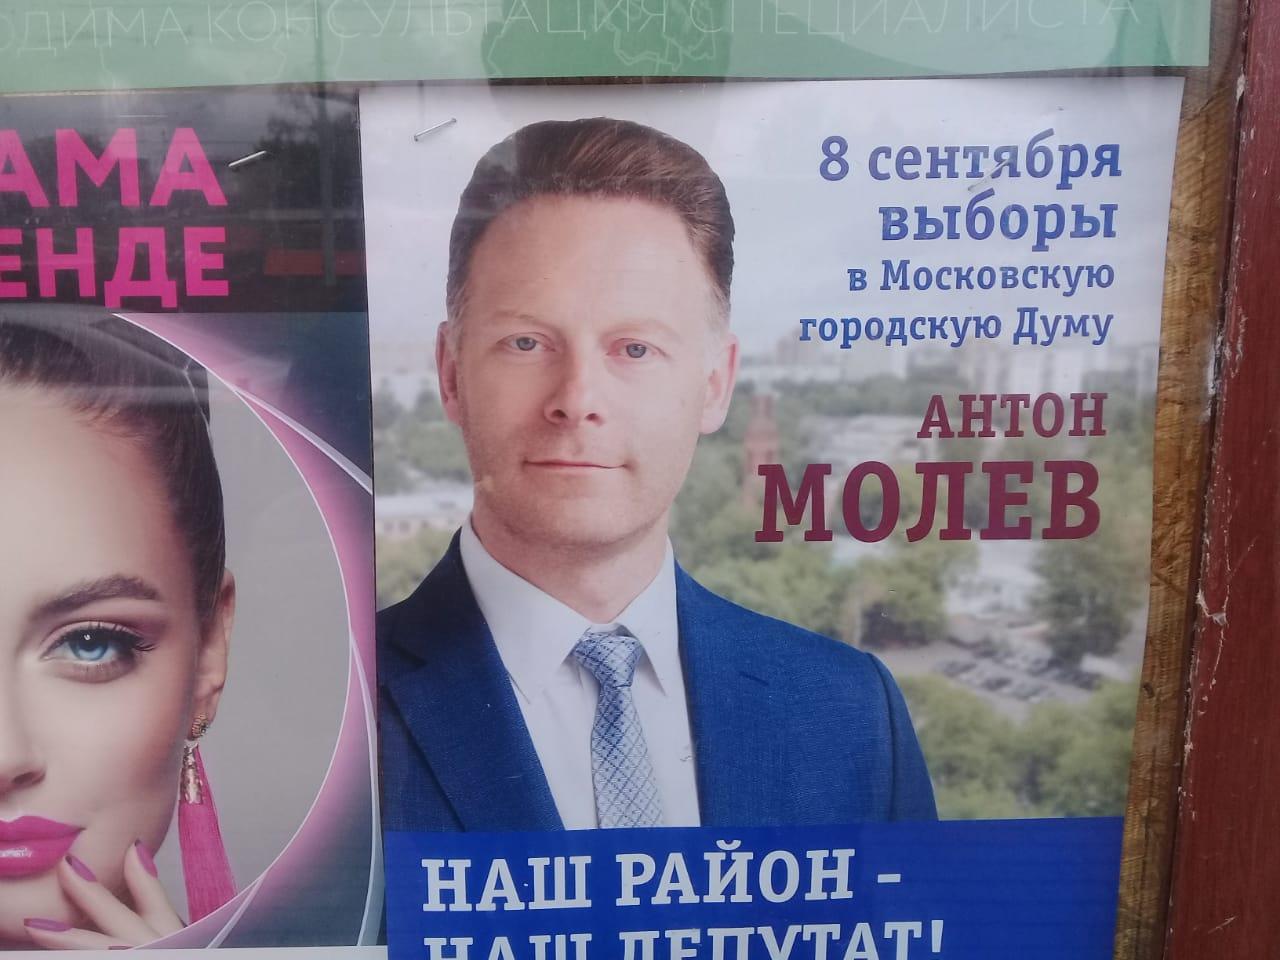 От Максима Калашникова и АПН Северо-Запад - о текущем